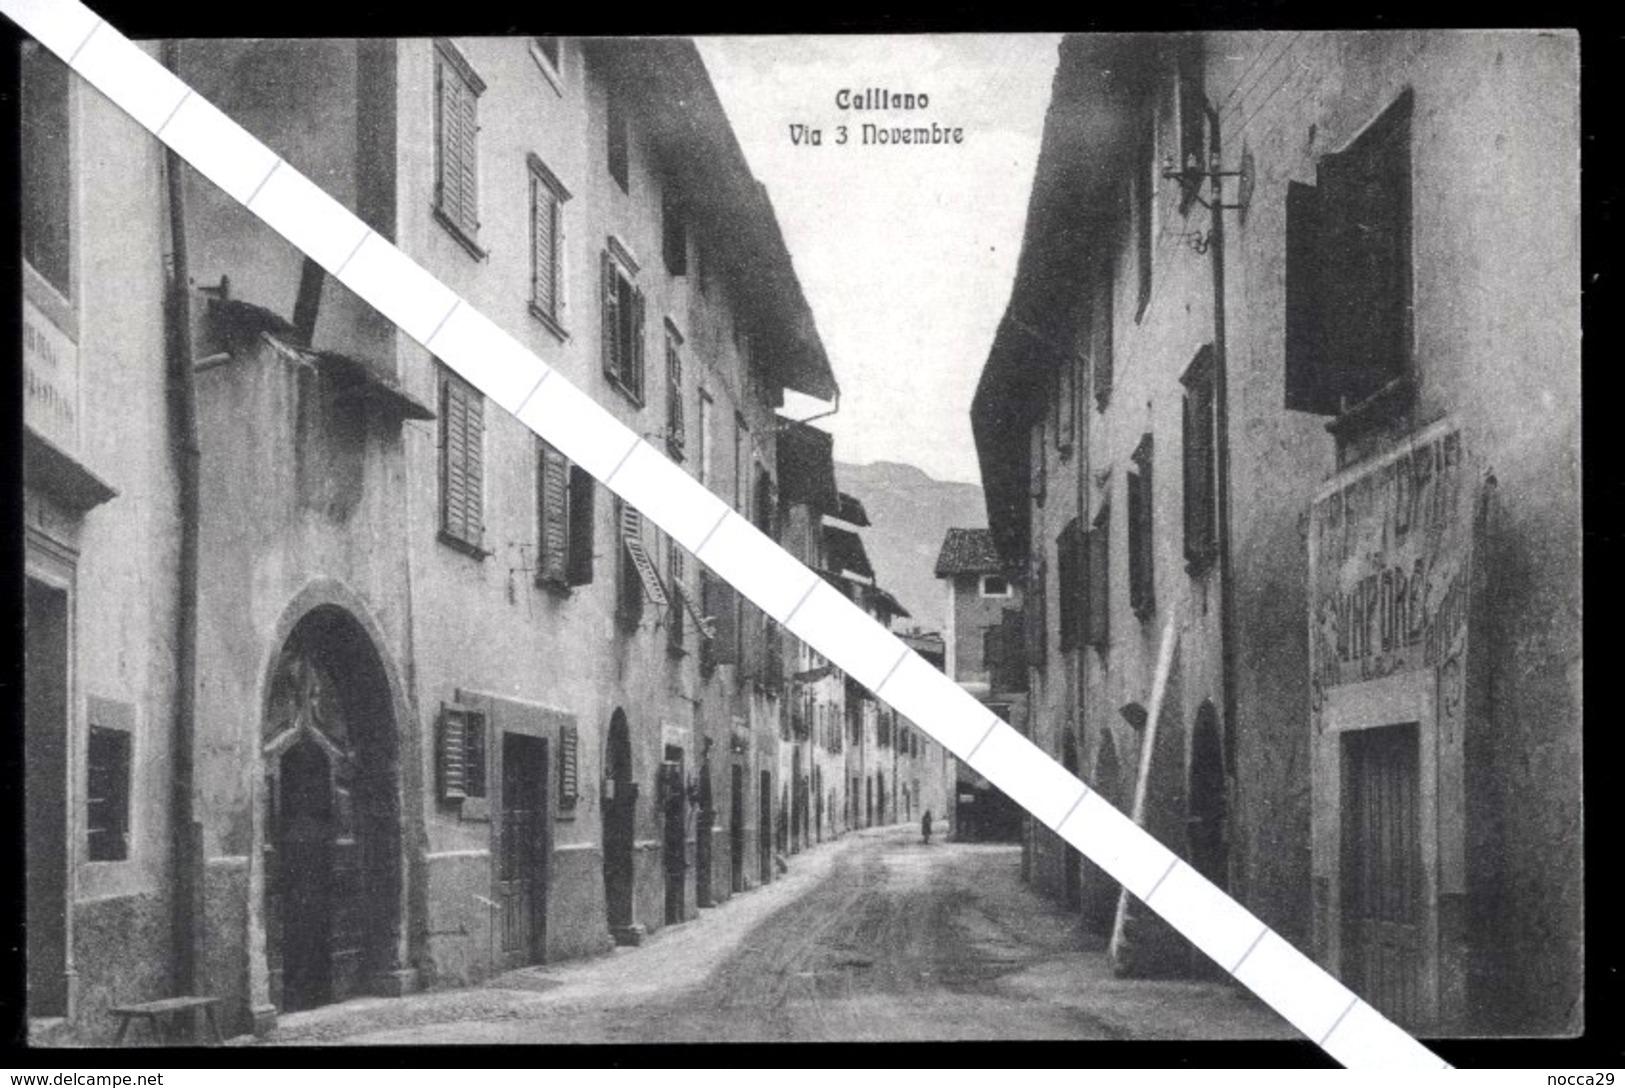 CALLIANO - TRENTO - 1920 - VIA  3 NOVEMBRE - Trento